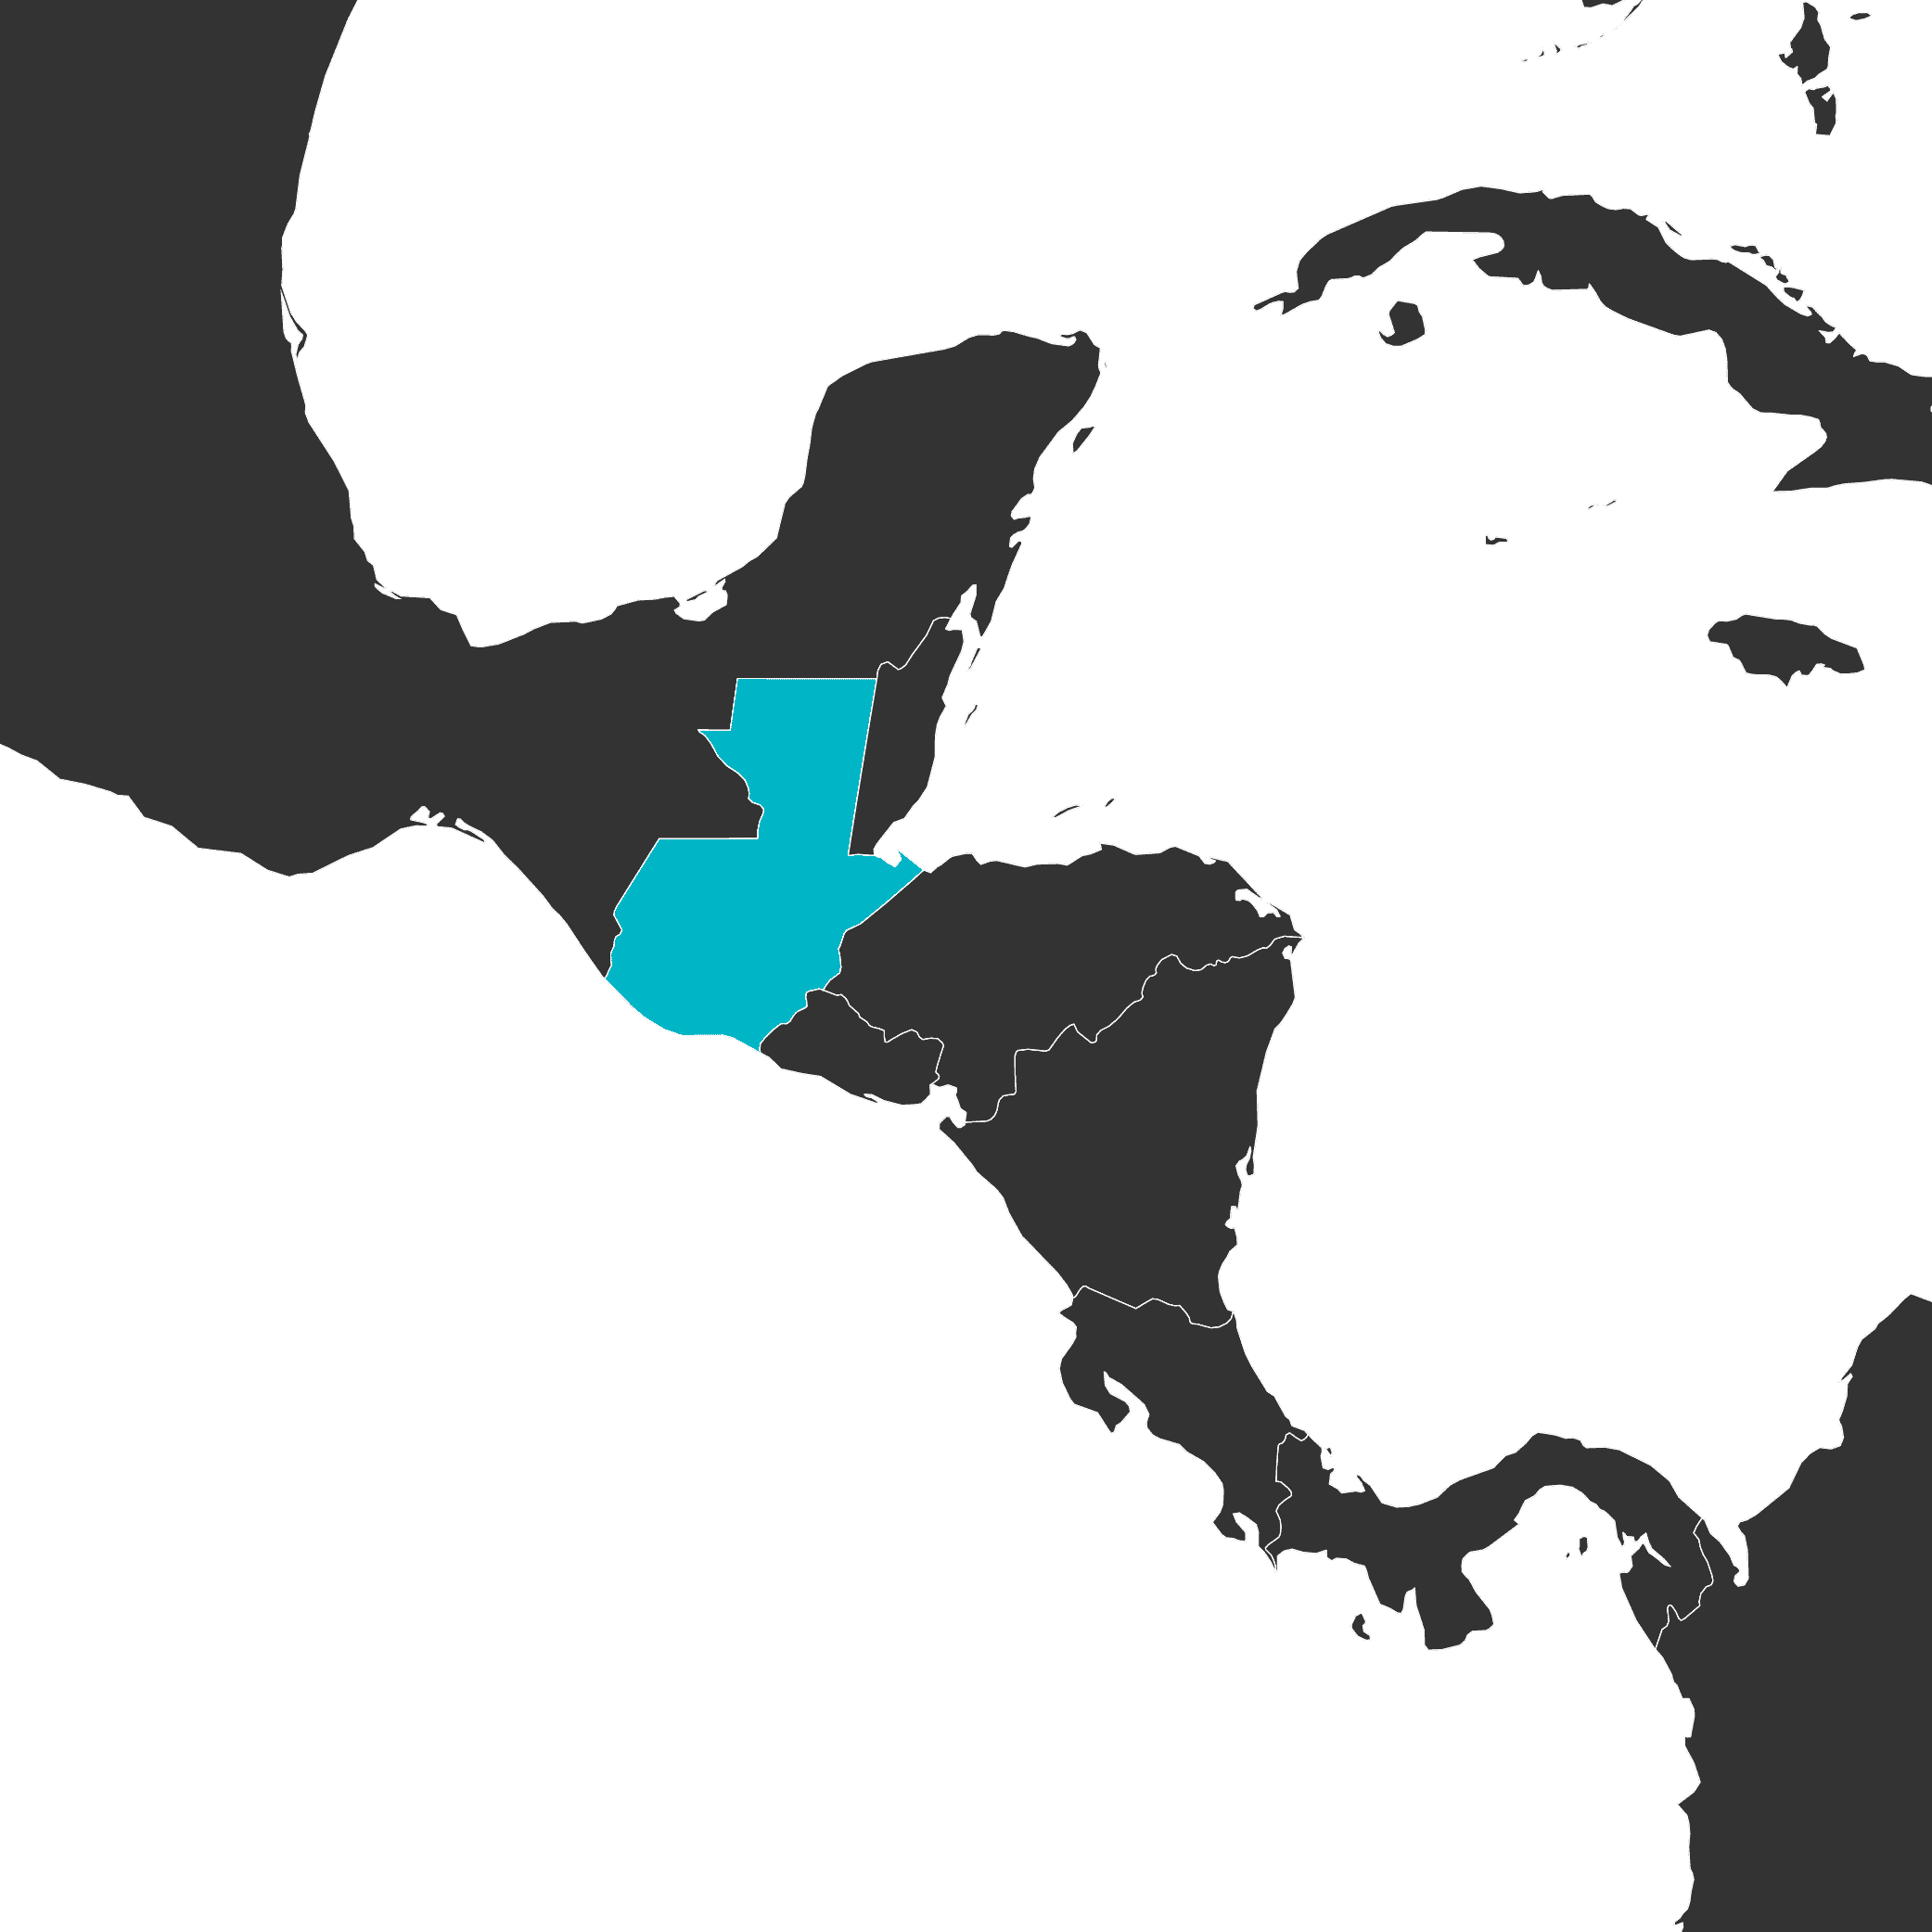 GUATEMALA: Leadership hub, designed by natalia escobar and Fen Wang, sponsored by integral group